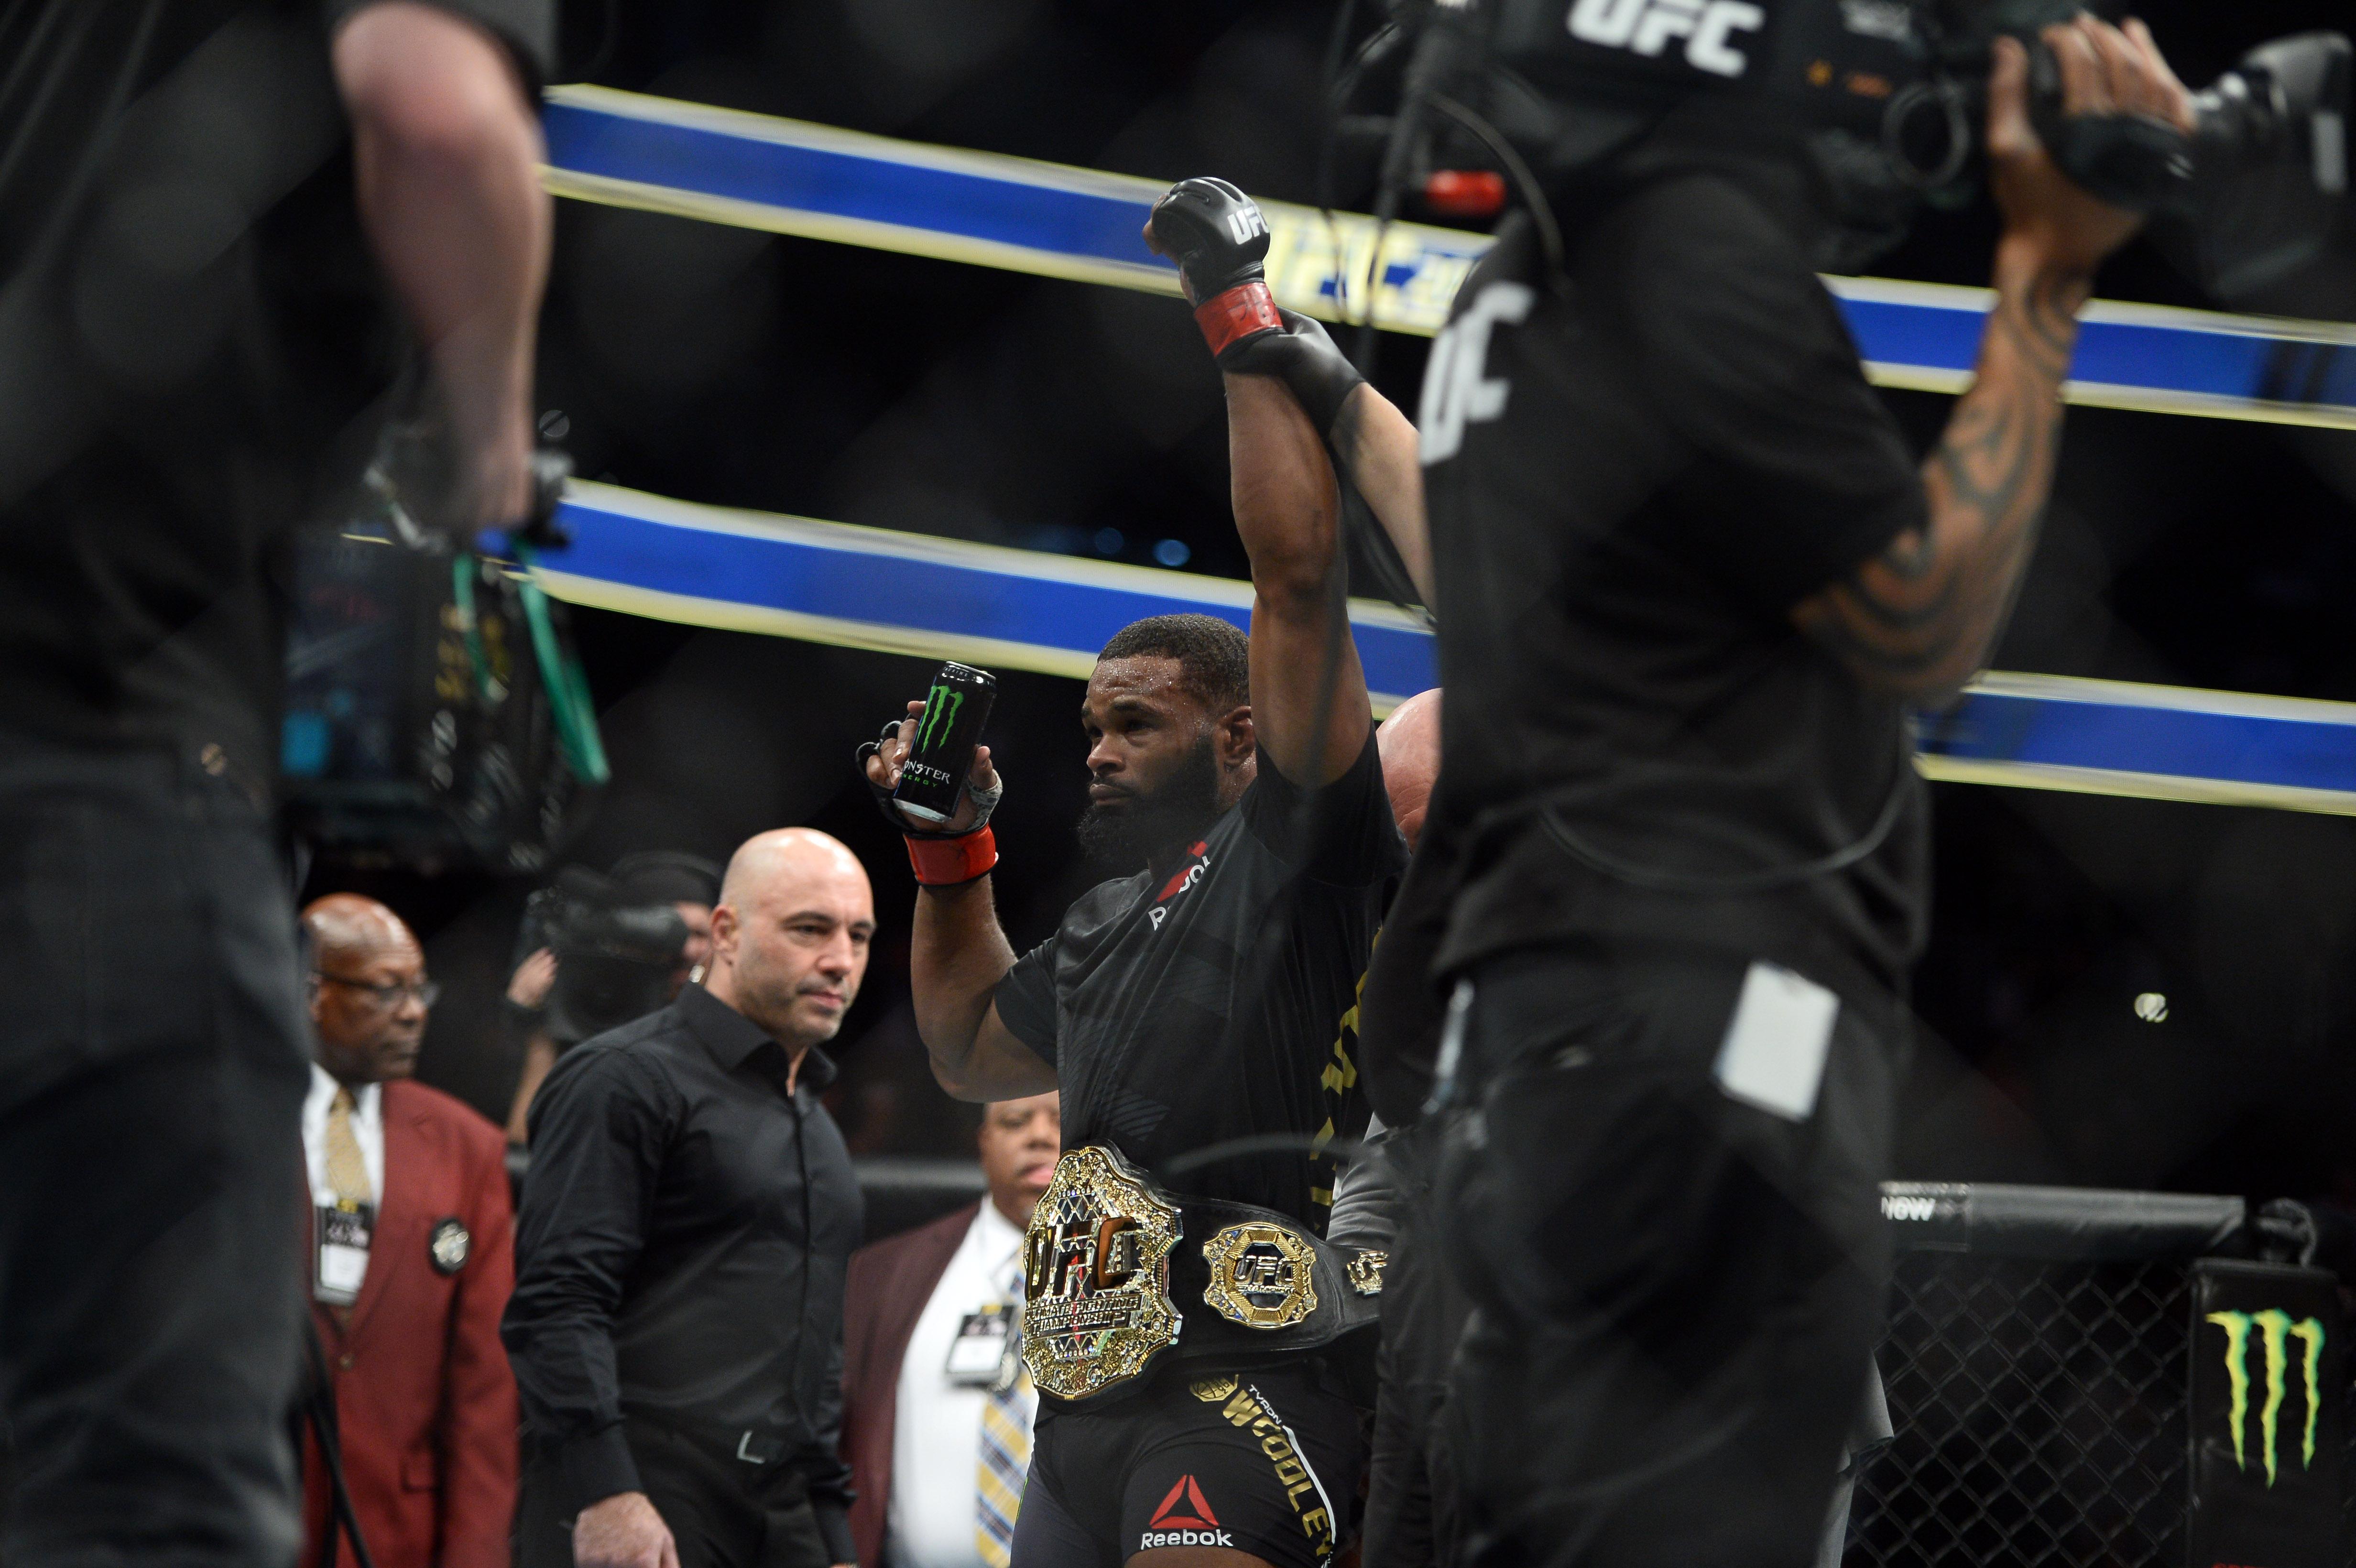 MMA: UFC 209-Woodley vs Thompson